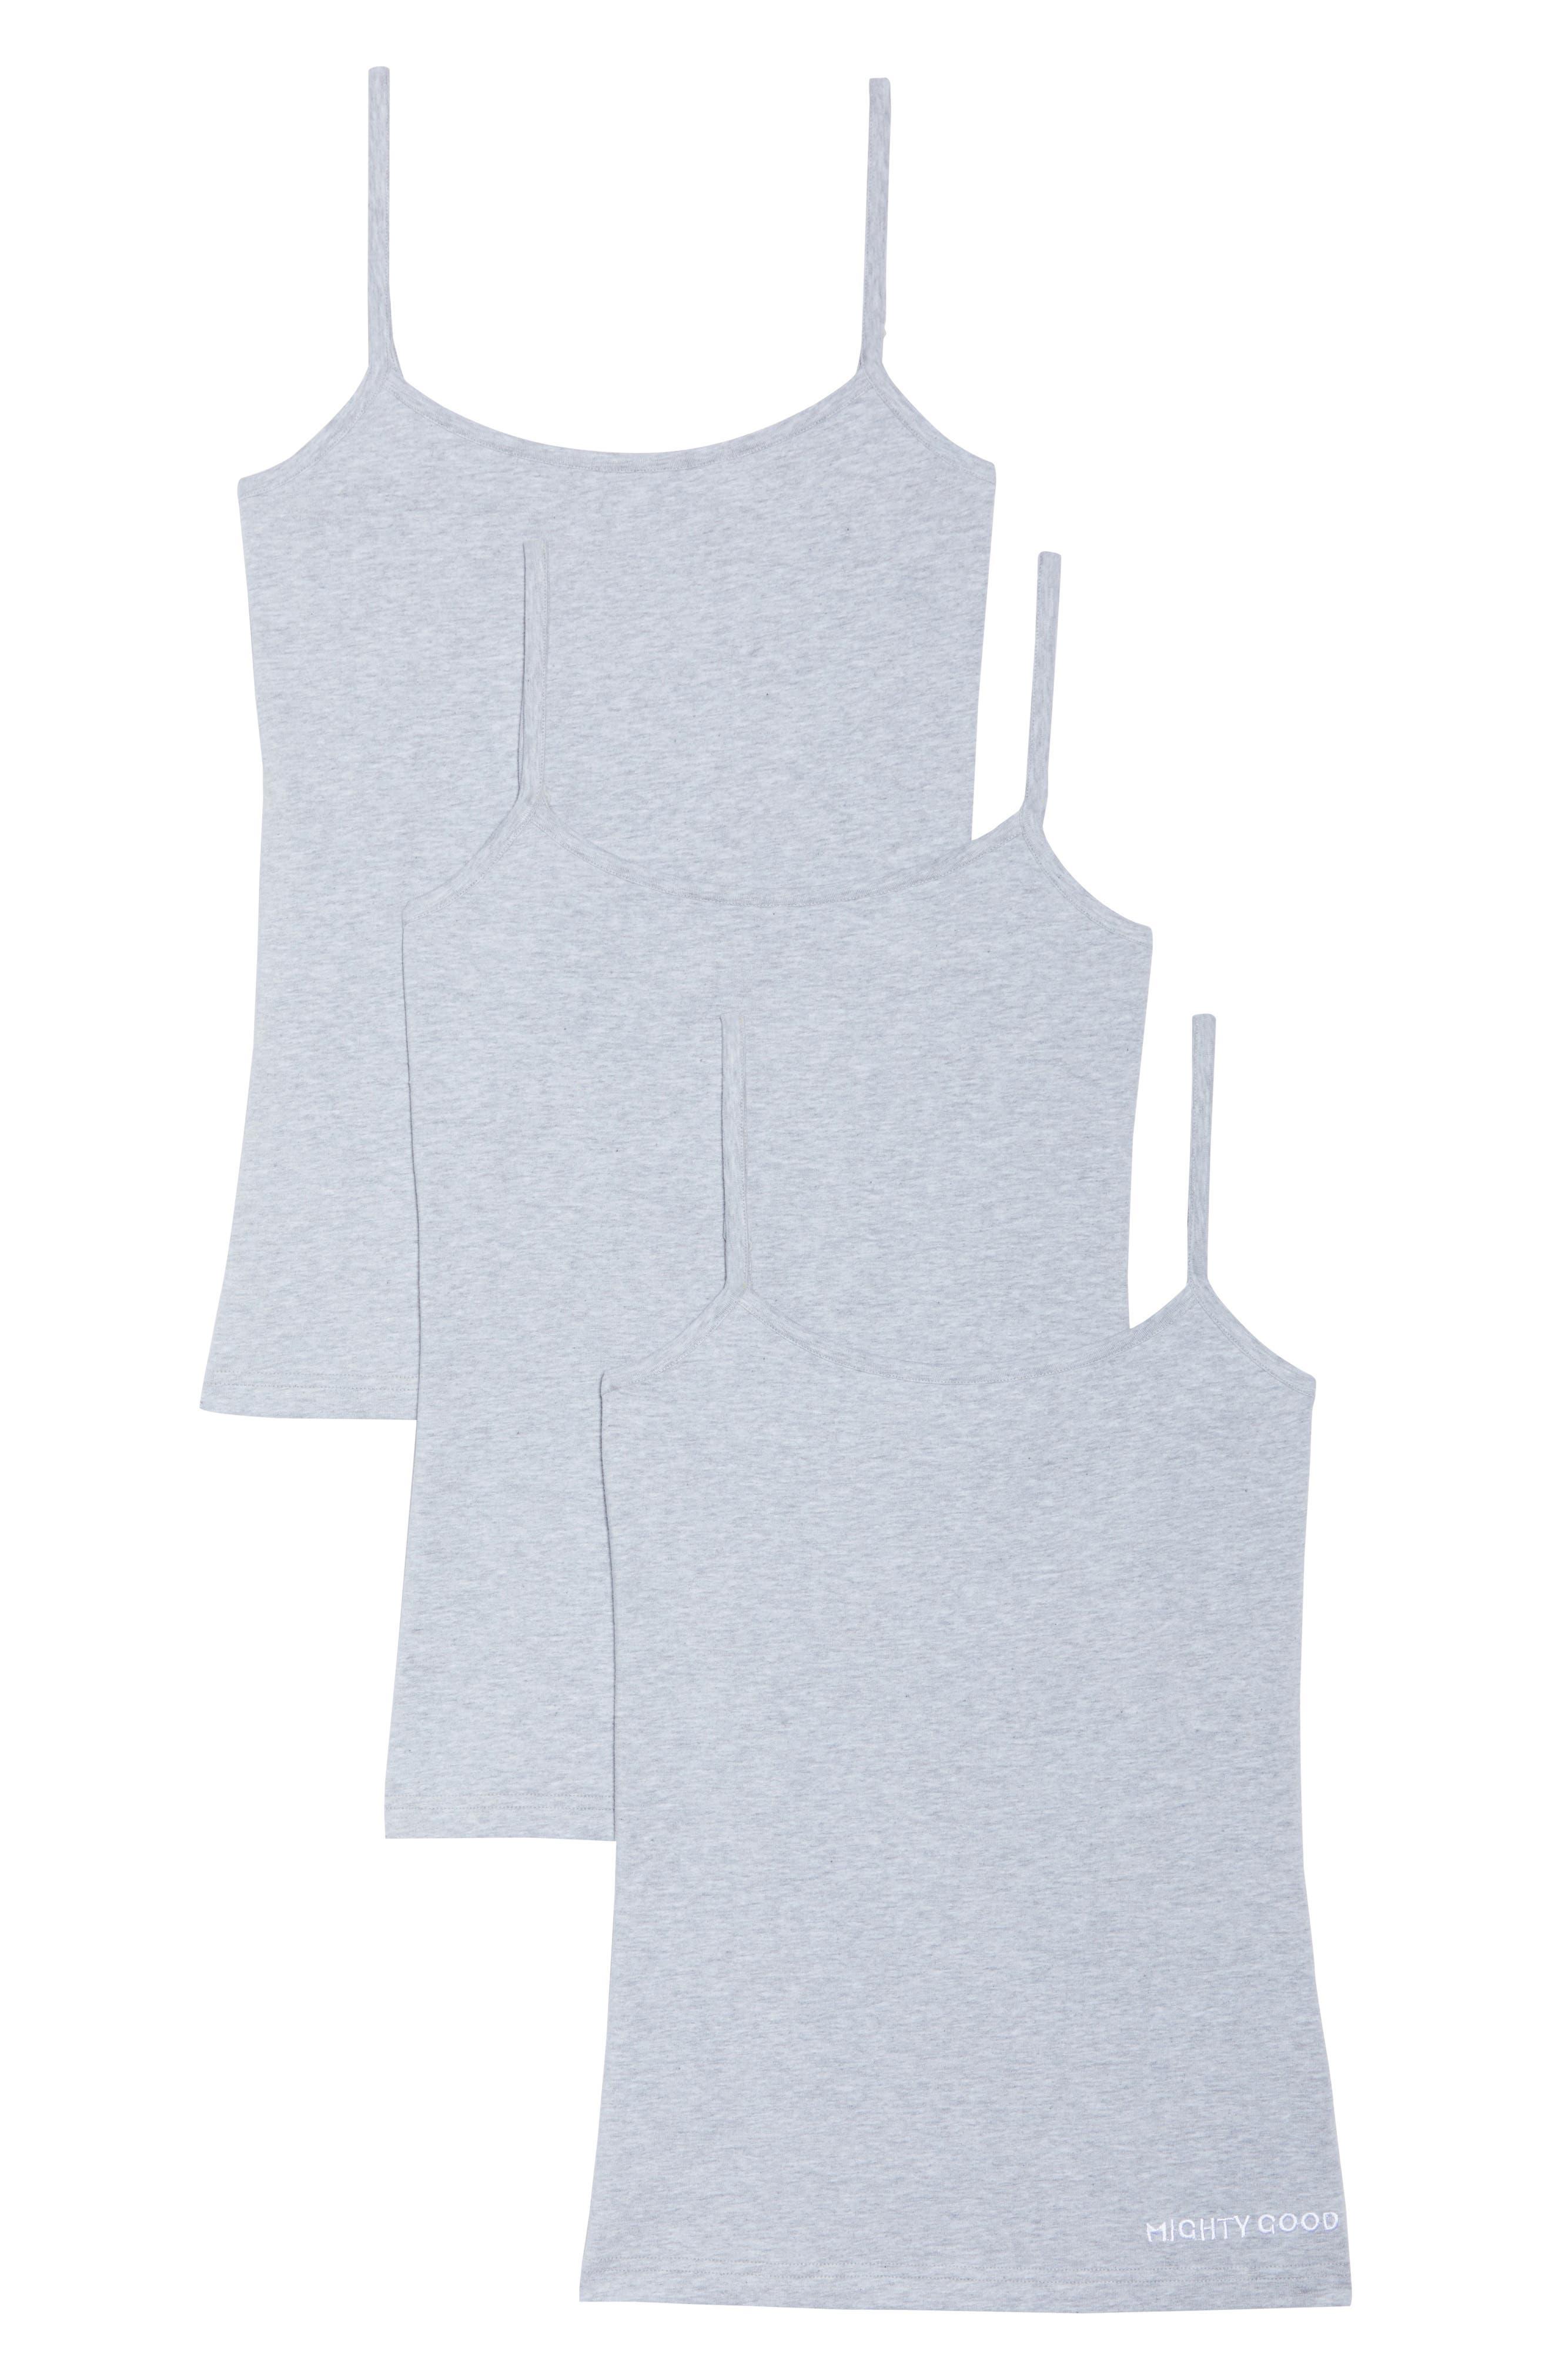 Mighty Good Undies 3-Pack Stretch Organic Cotton Camisoles